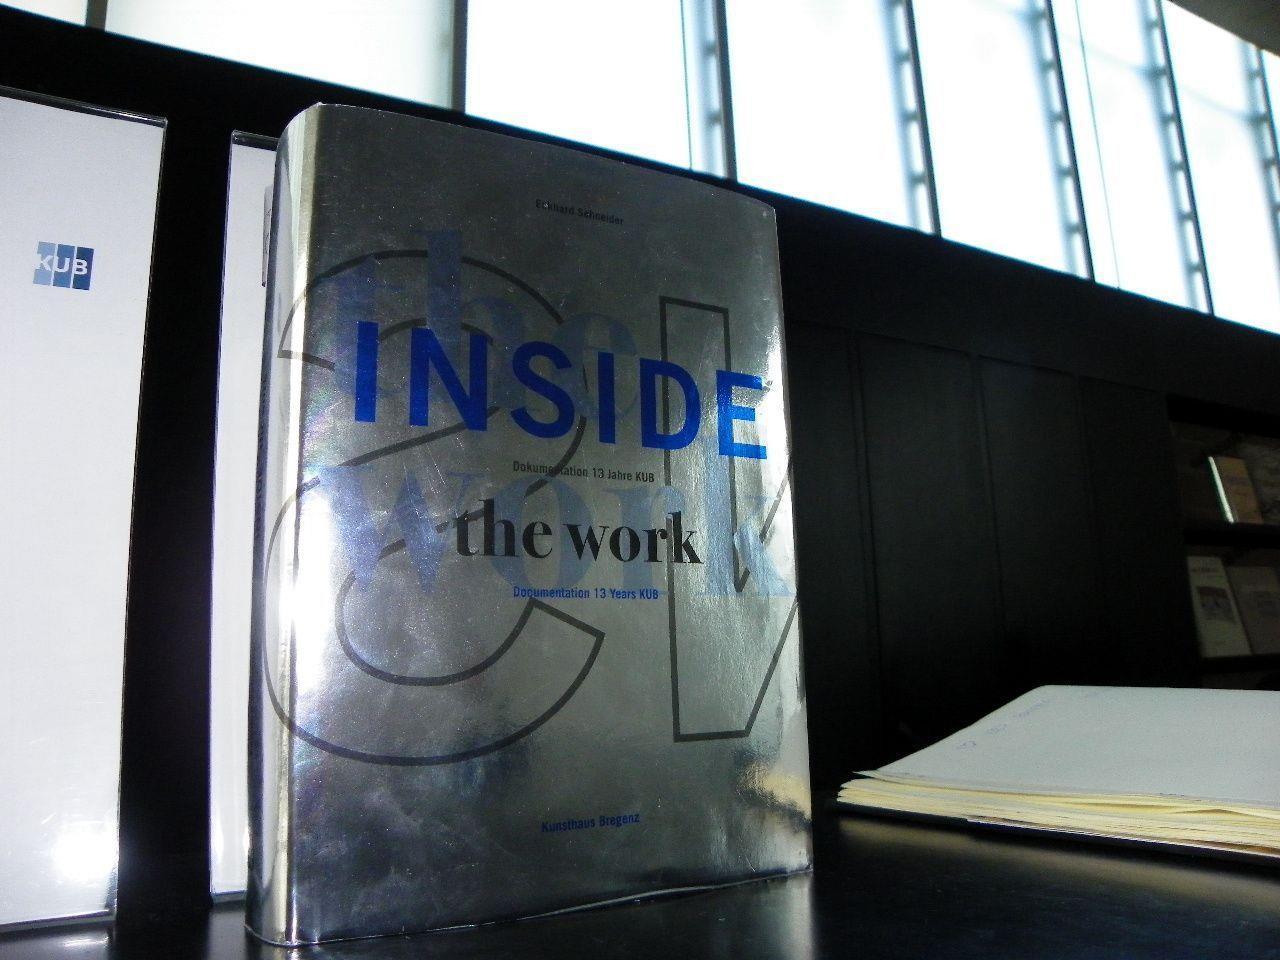 Dokumentation 13 Jahre Kunsthaus